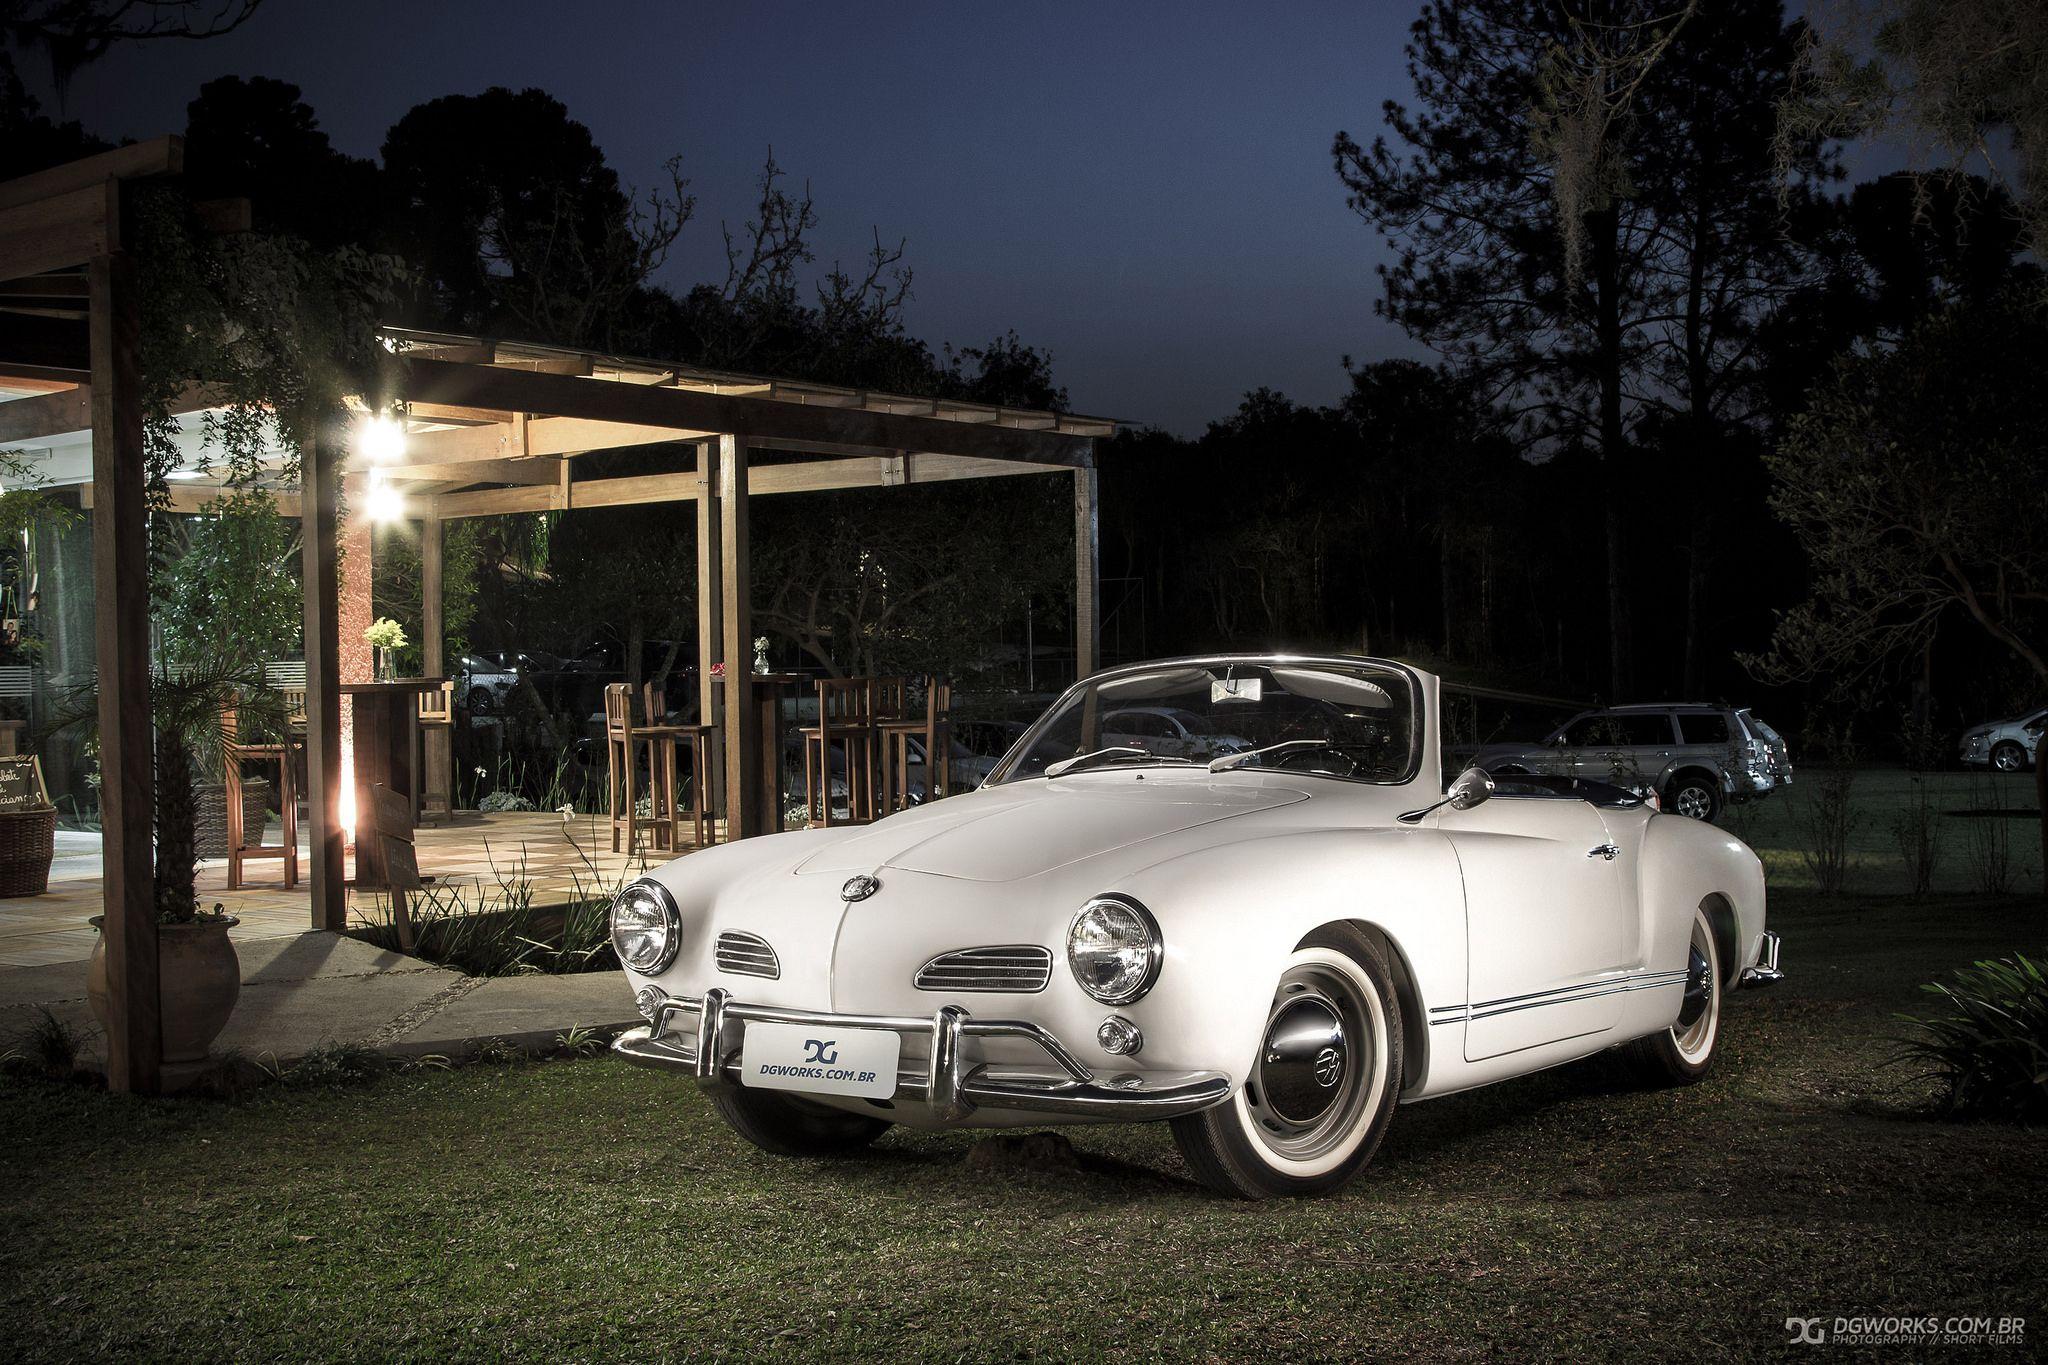 VW Karmann Ghia Cabriolet. Photo by Pedro Ruta Jr.  #dgworks #karmann #vw